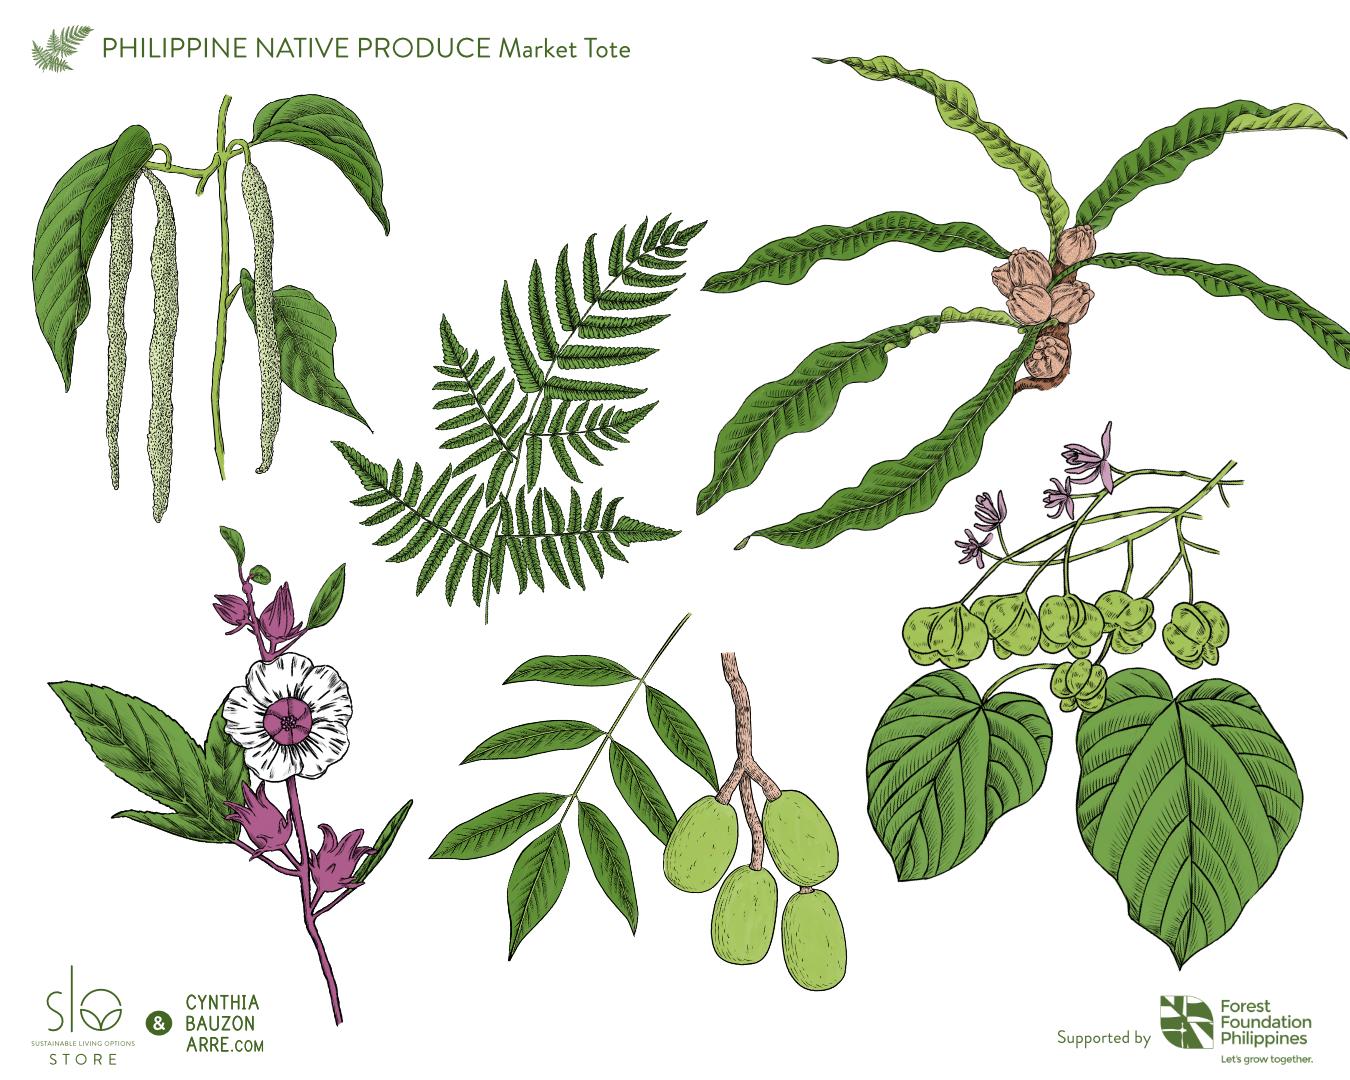 Philippine native food-bearing plants